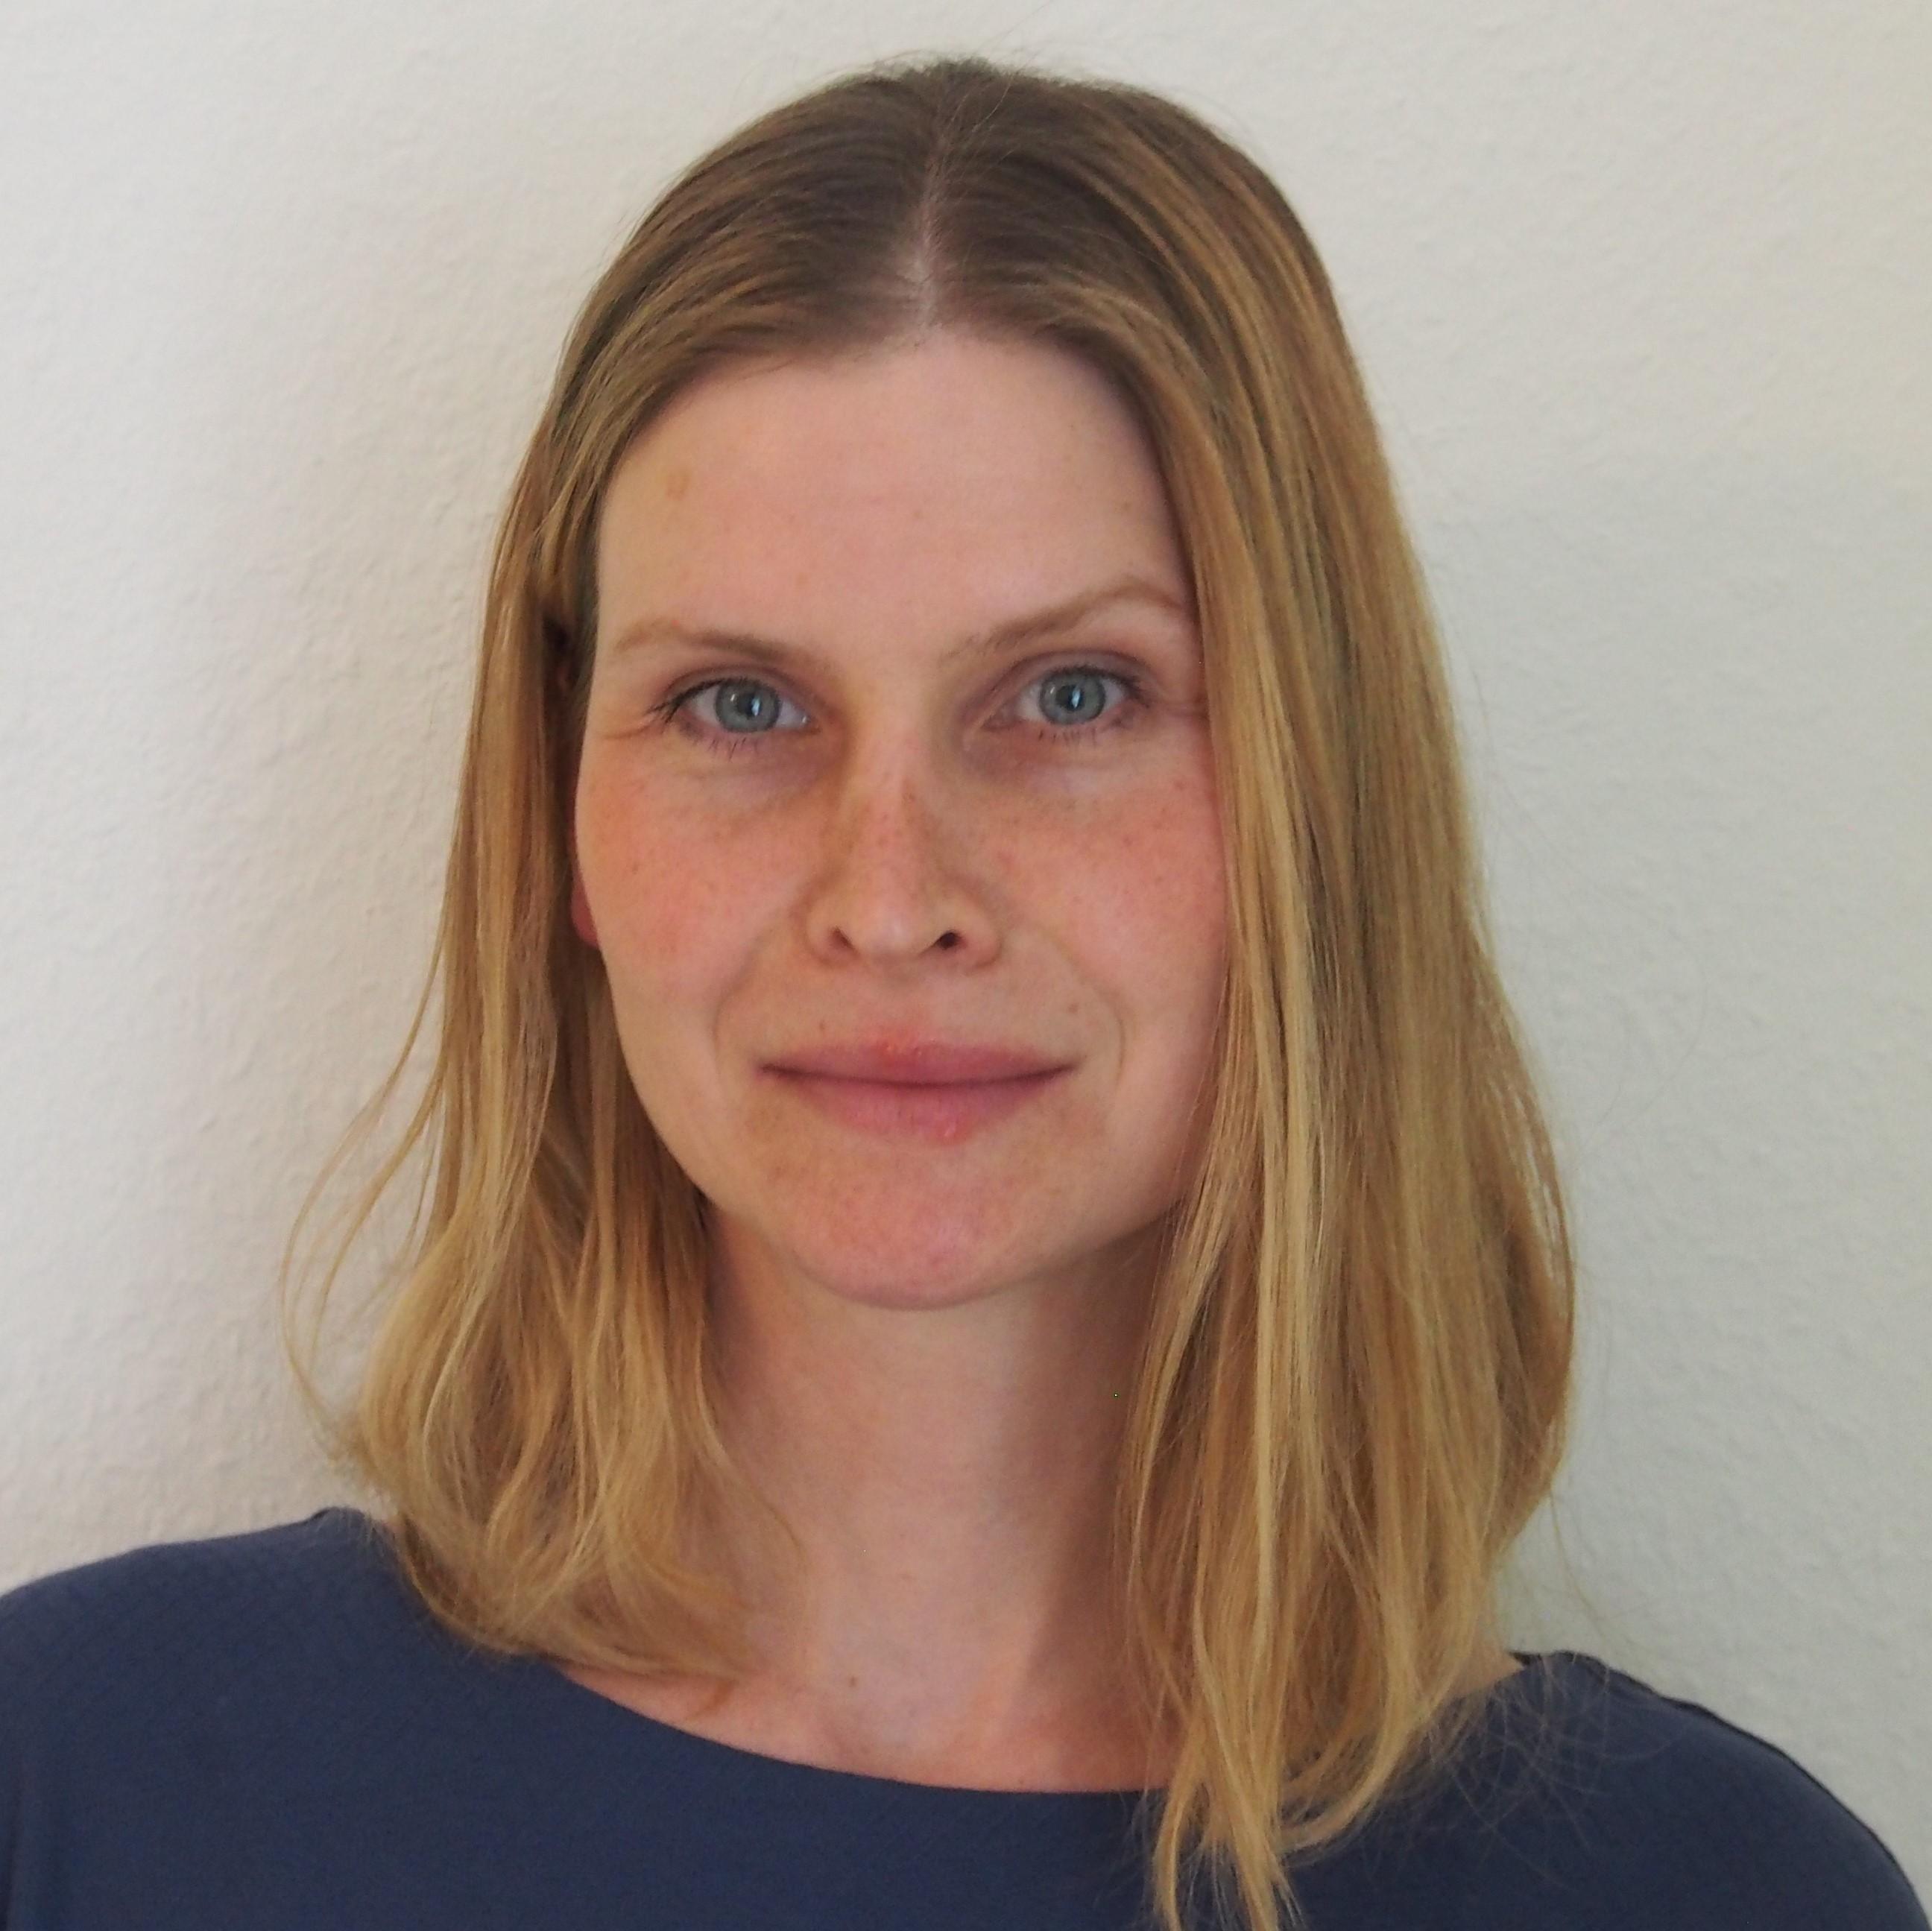 Hedda Schablowsky